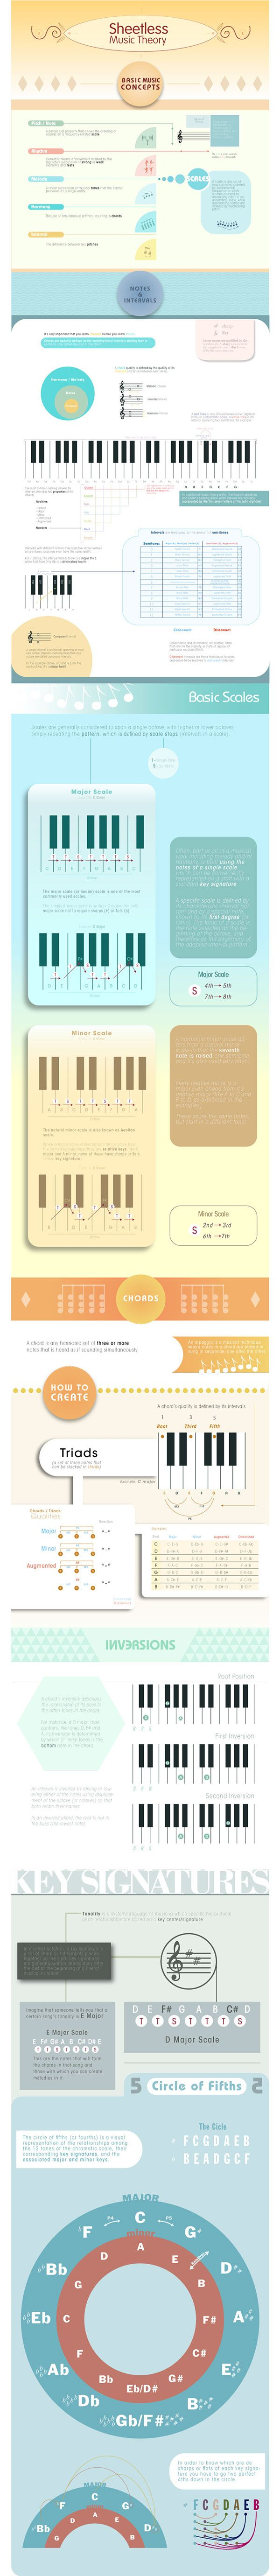 Sheetless Music Theory | INFOGRAPHICS on Behance